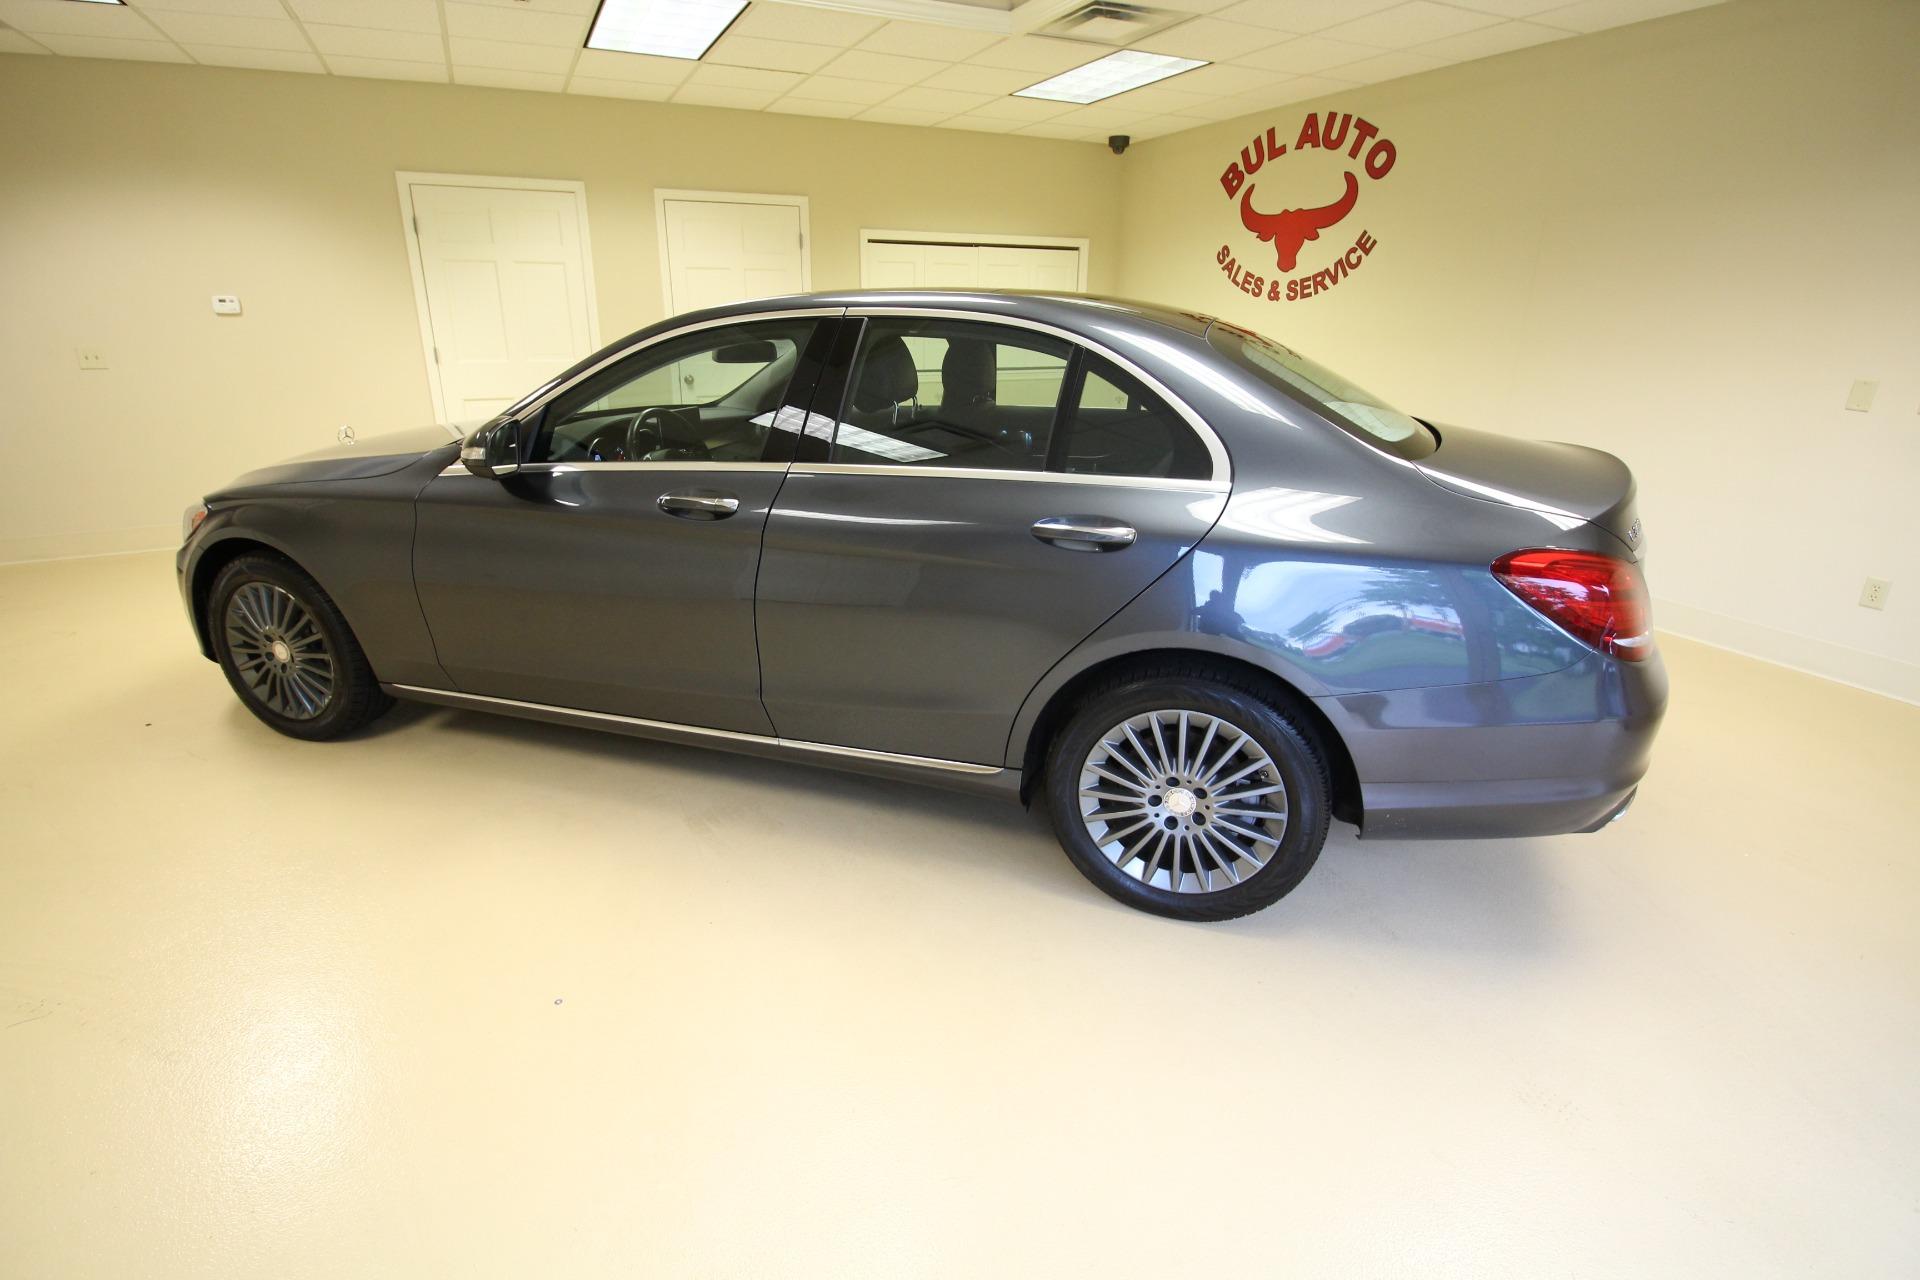 Used 2015 Mercedes-Benz C-Class C300 4MATIC SEDAN NEW MASERATI TRADE VERY CLEAN | Albany, NY